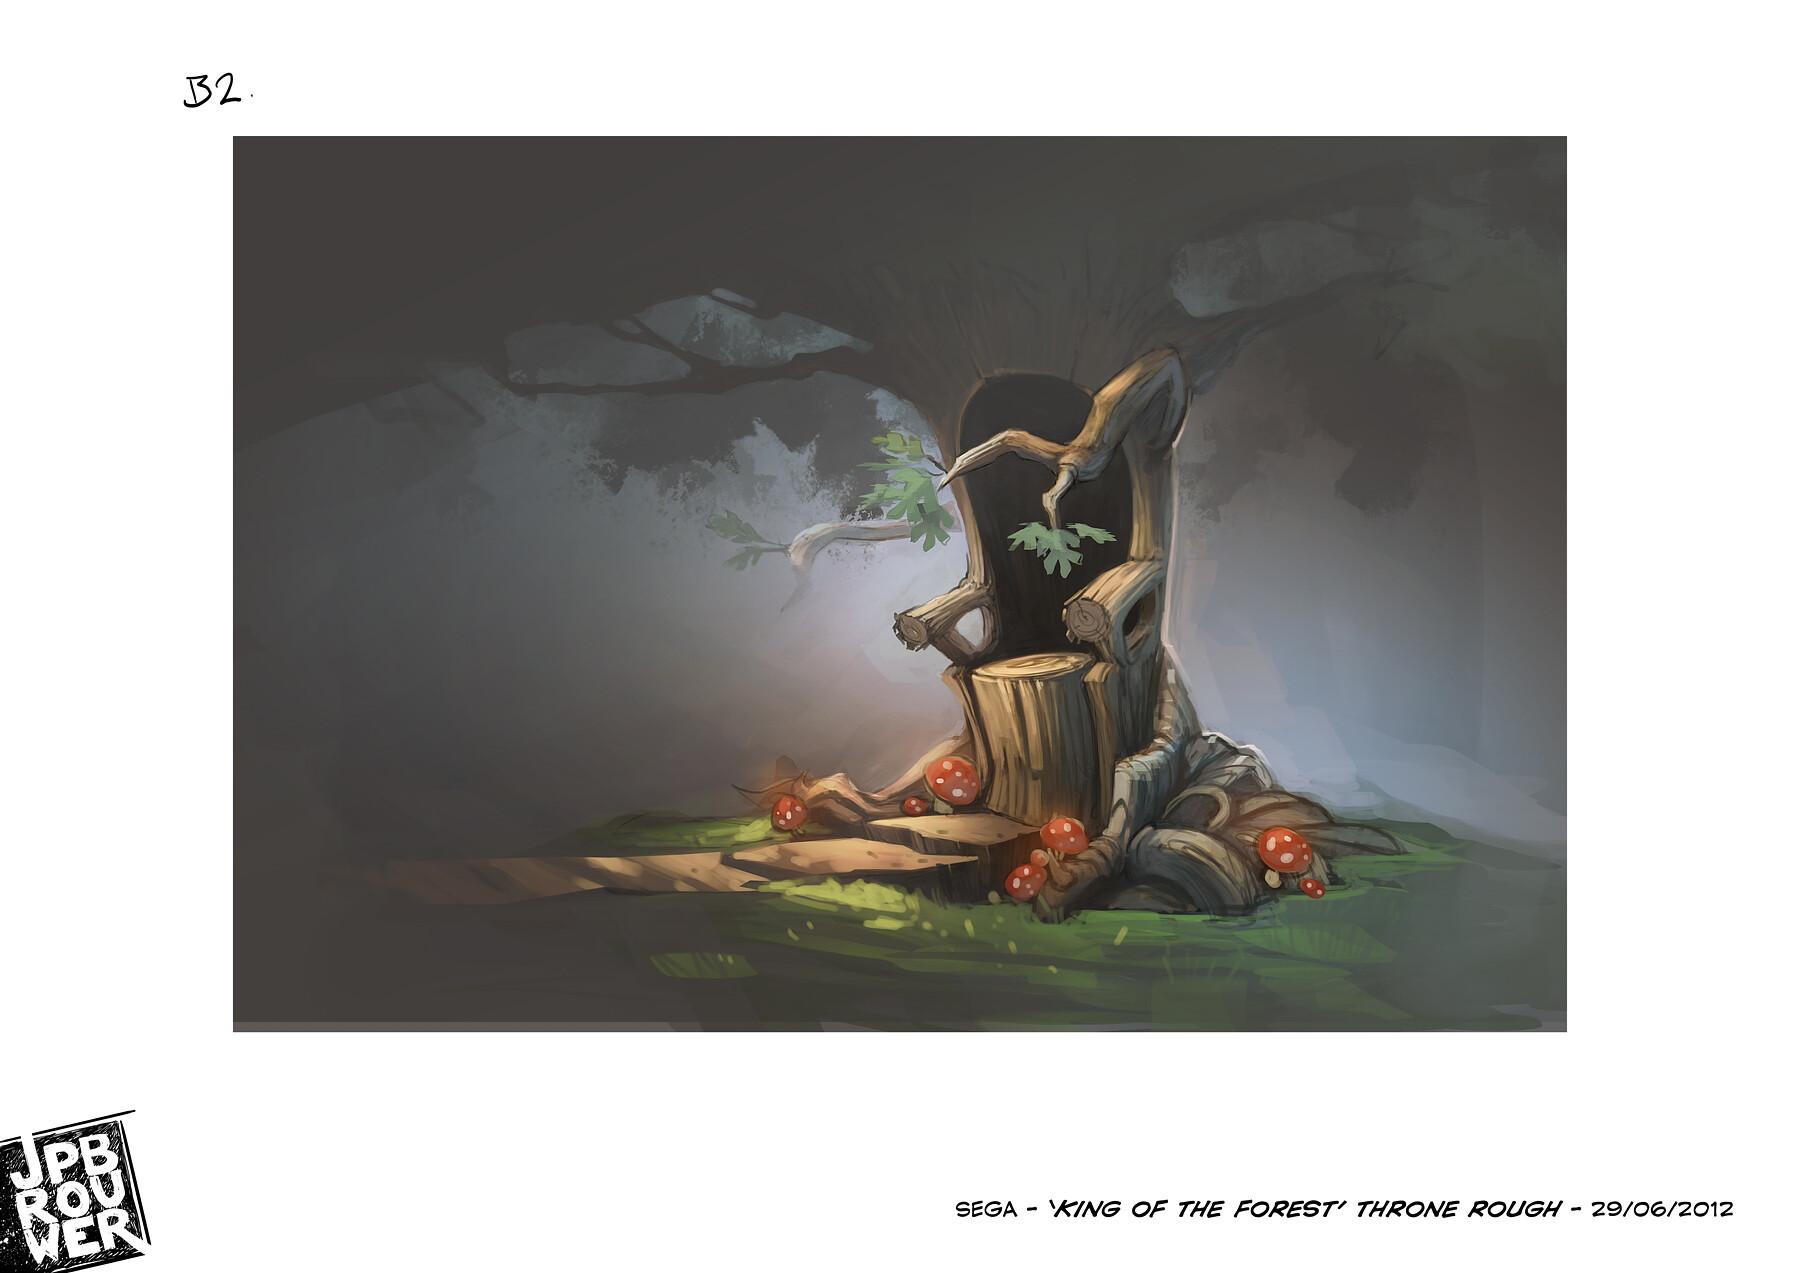 James brouwer sega kingoftheforest throne290612